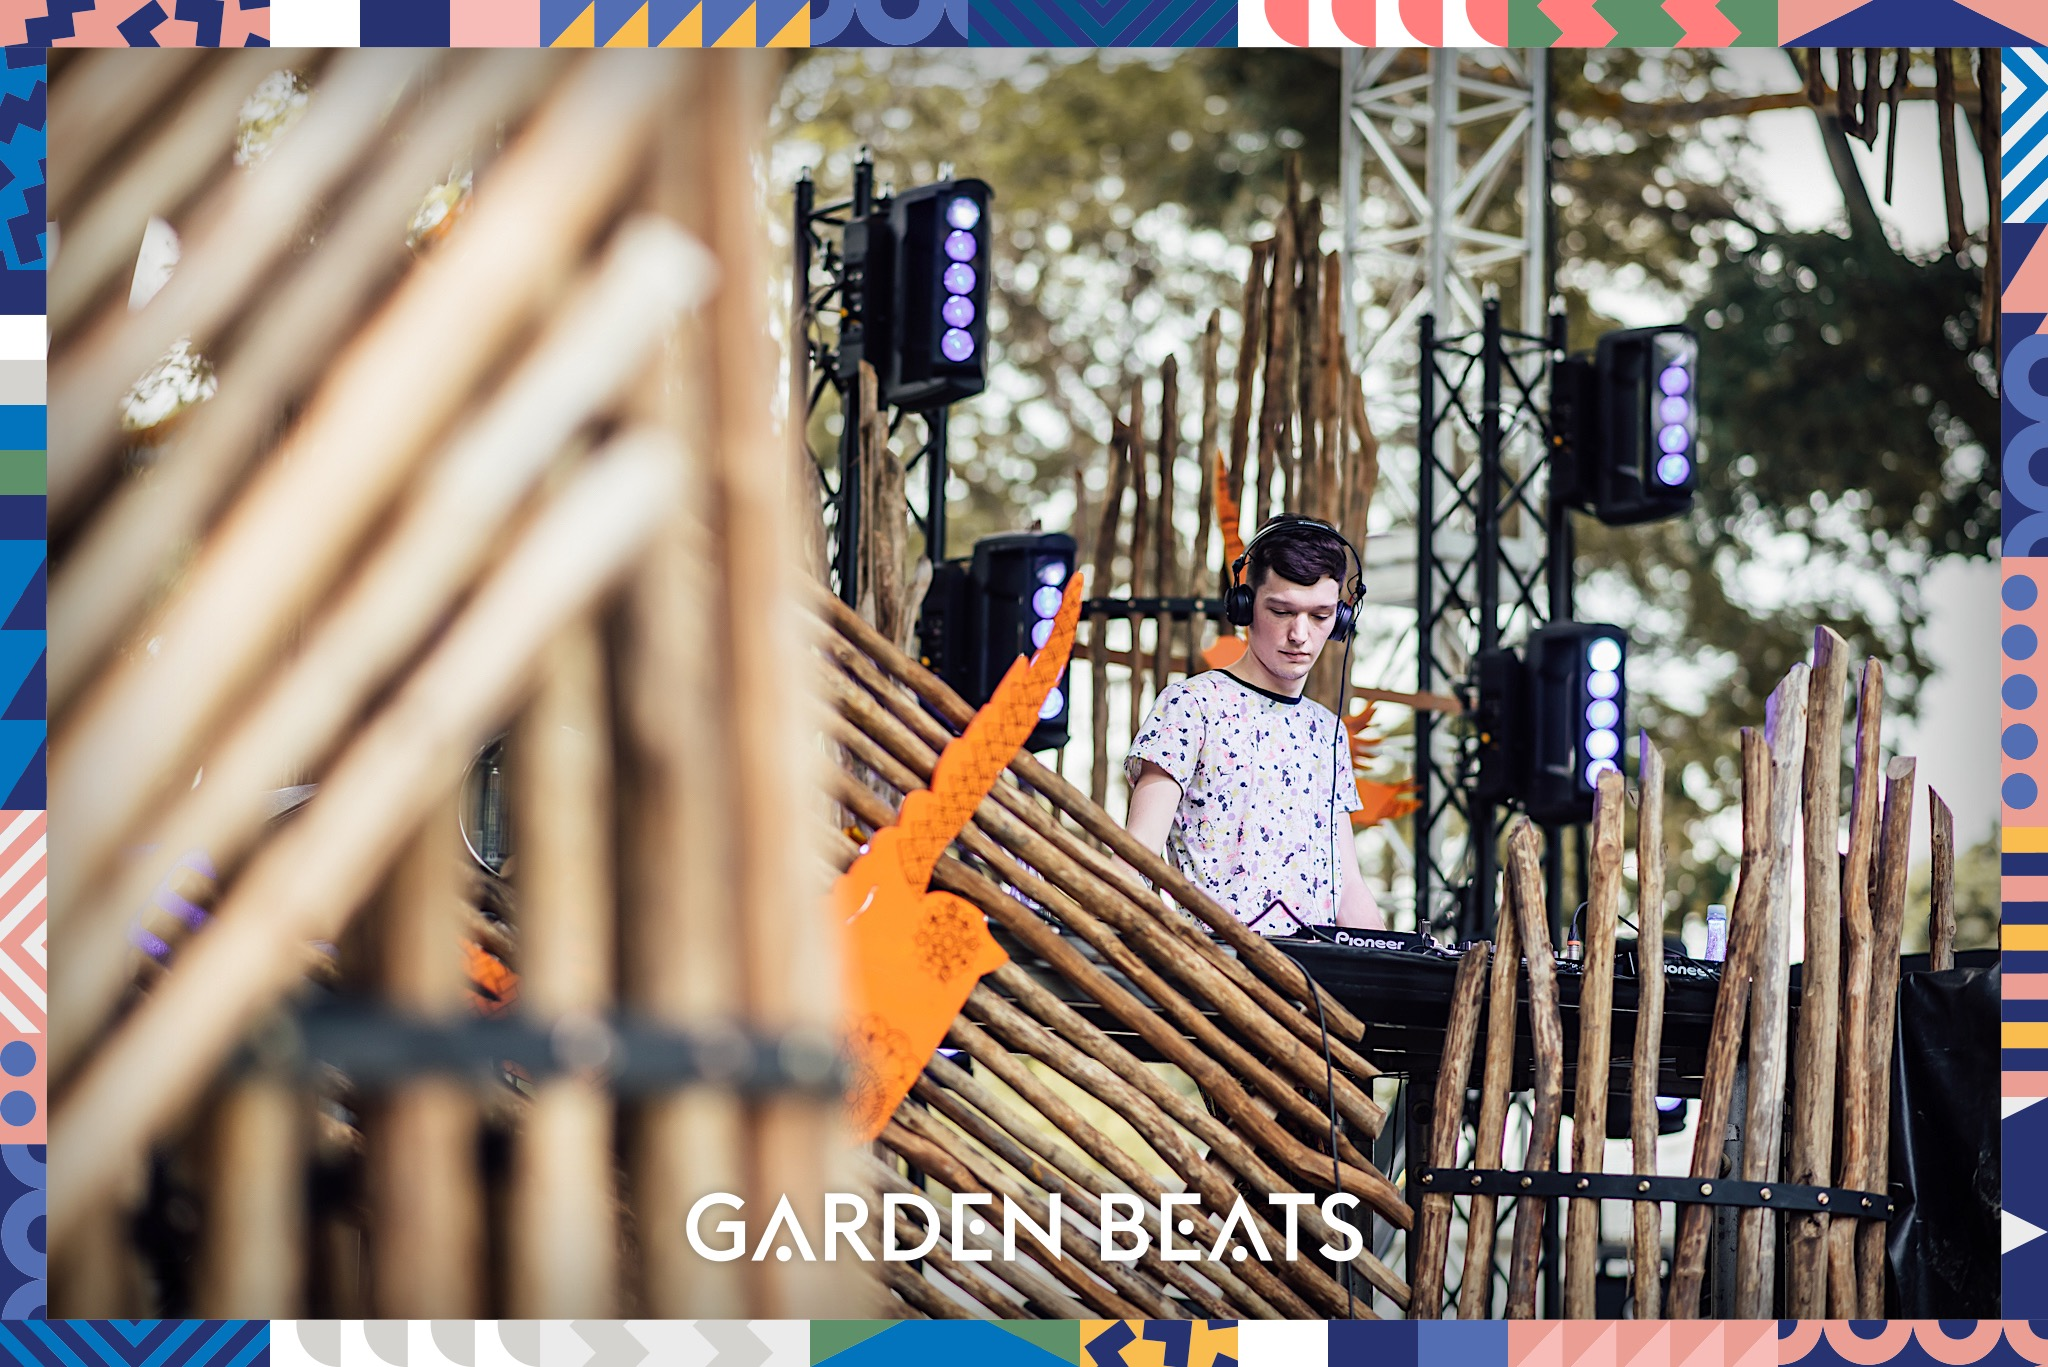 18032017_GardenBeats_Colossal097_WatermarkedGB.jpg